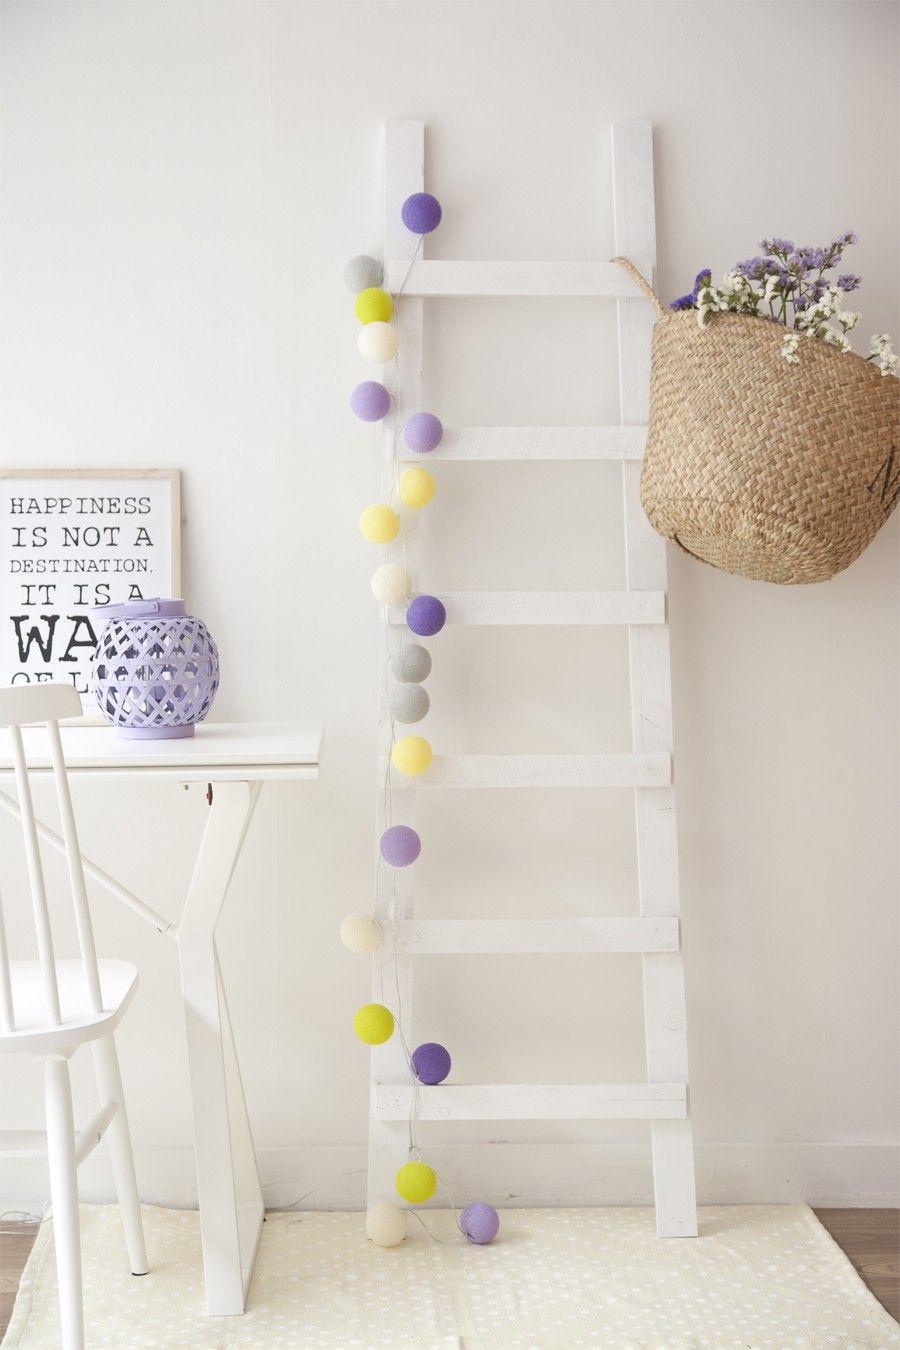 Limer escalera deco pinterest - Escaleras de madera decorativas ...